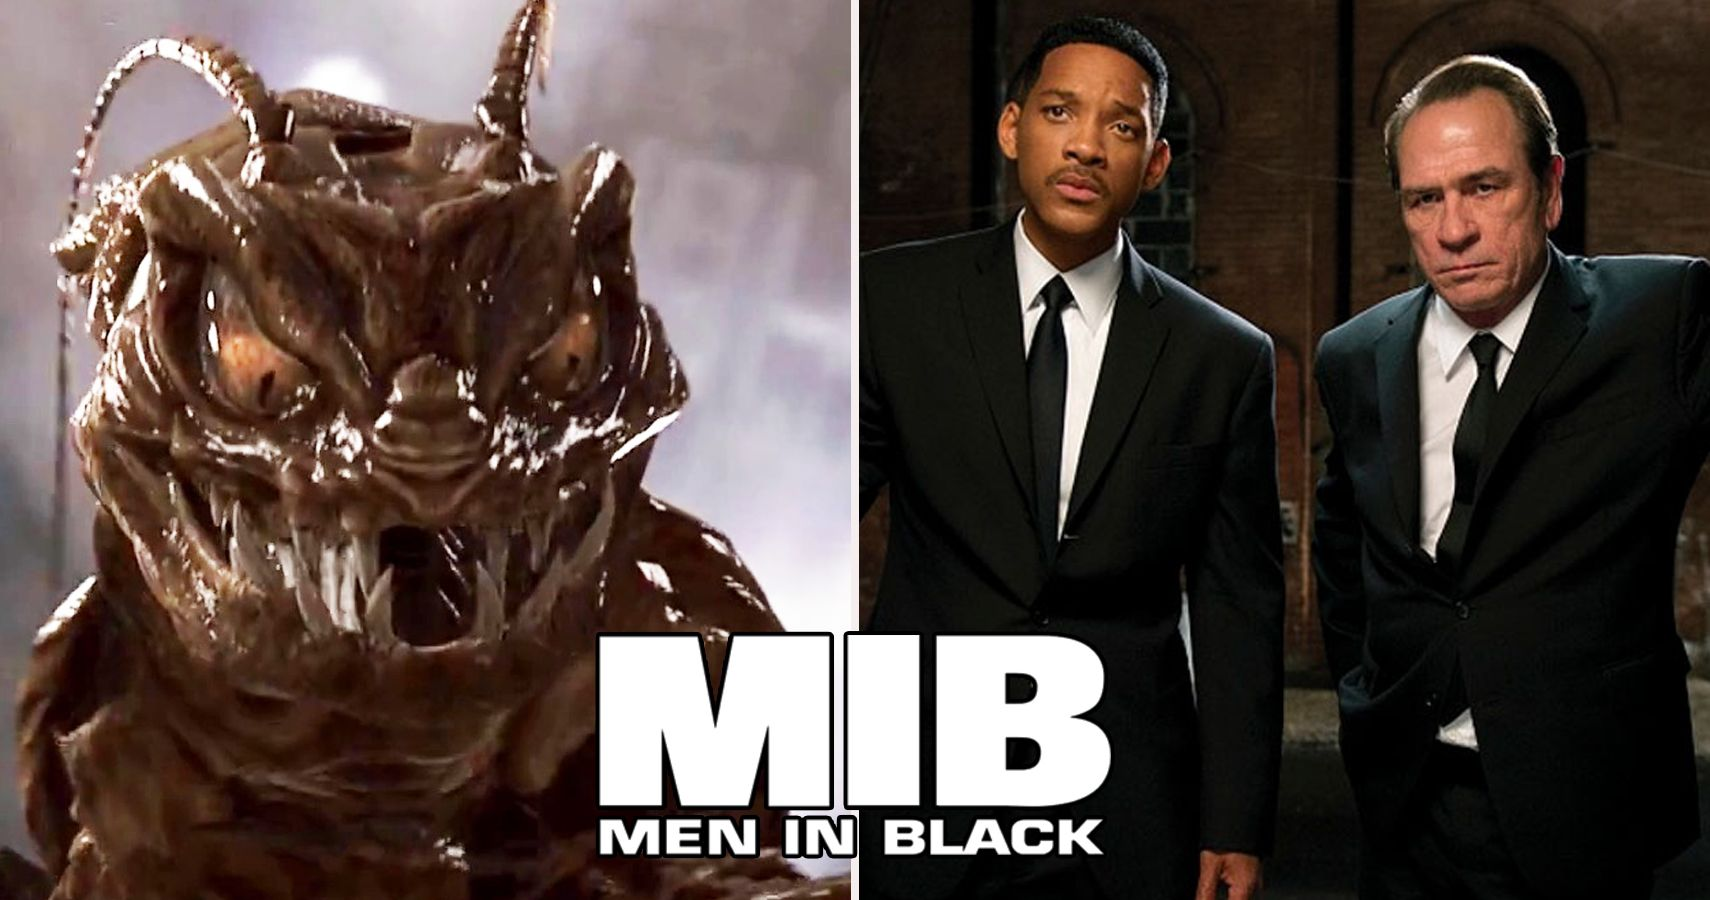 25 Behind The Scenes Secrets Fans Missed About Men In Black